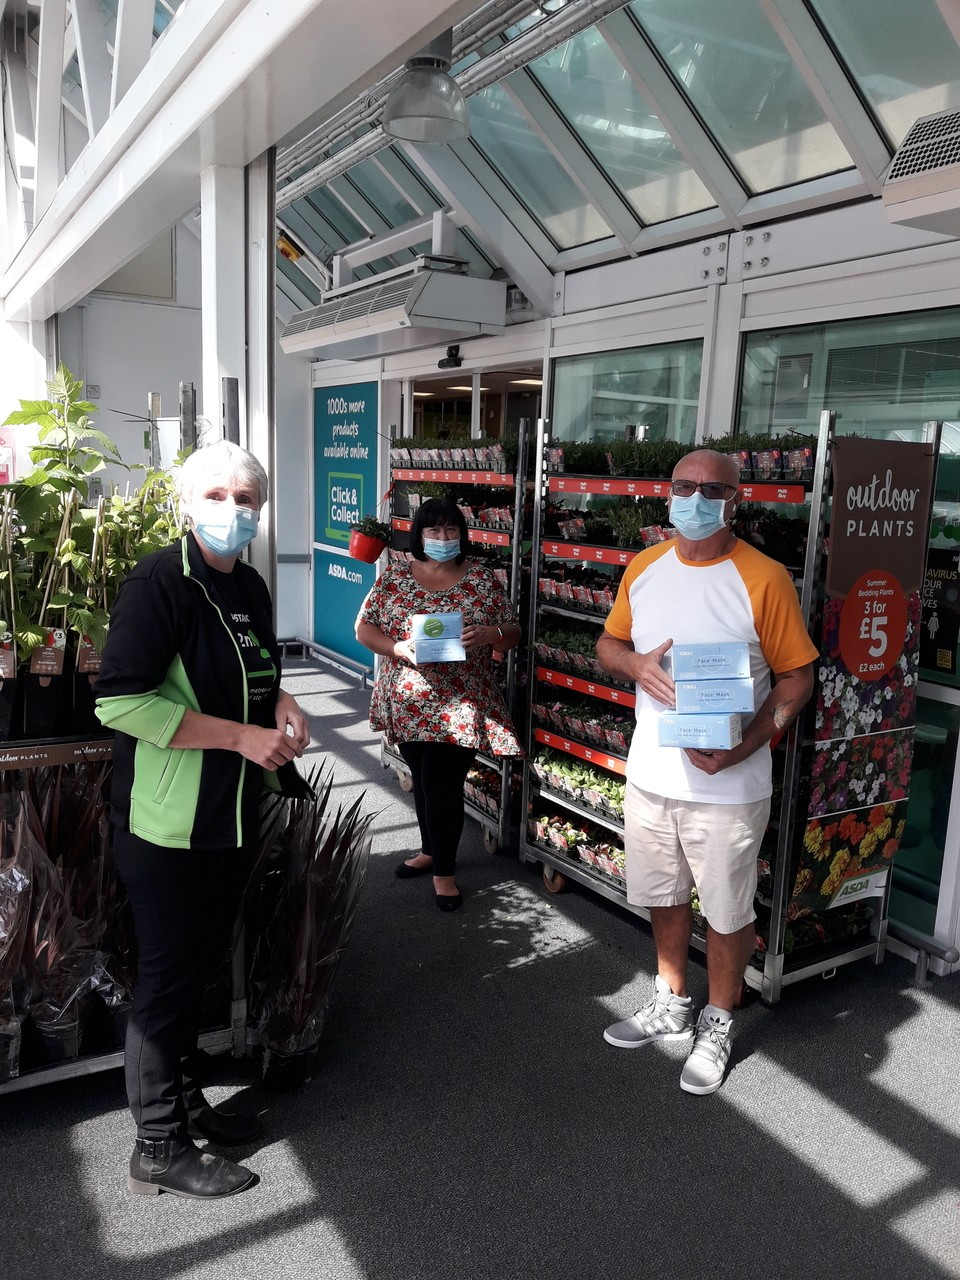 Care home donation | Asda St Helens